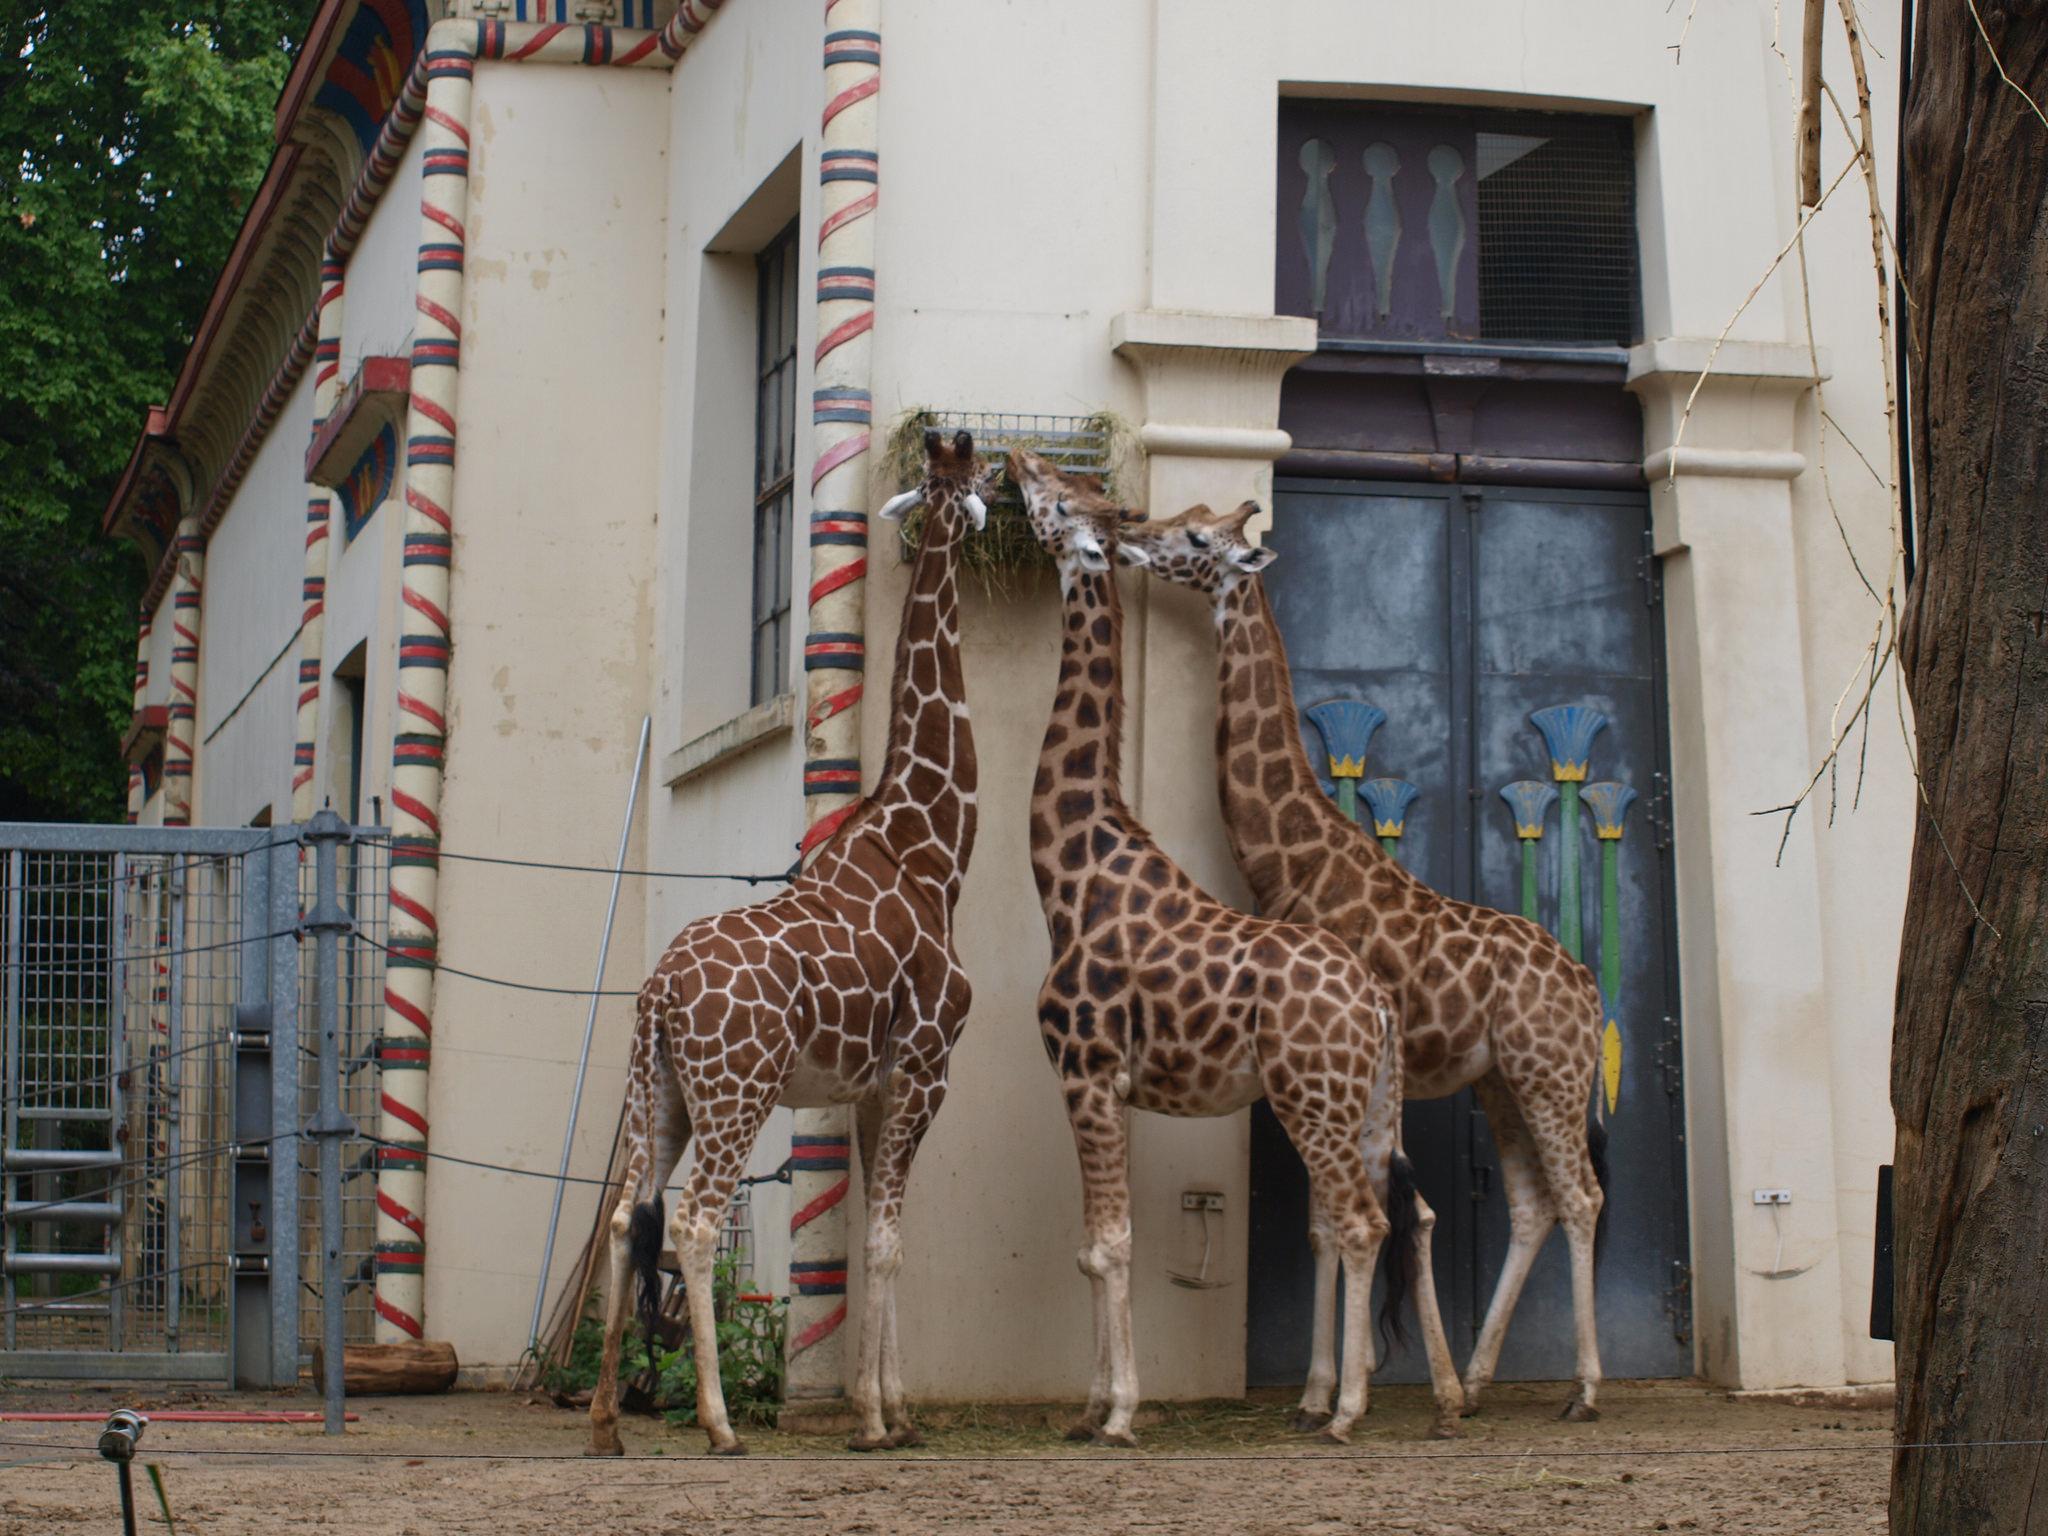 Антверпенский зоопарк, вольер с жирафами